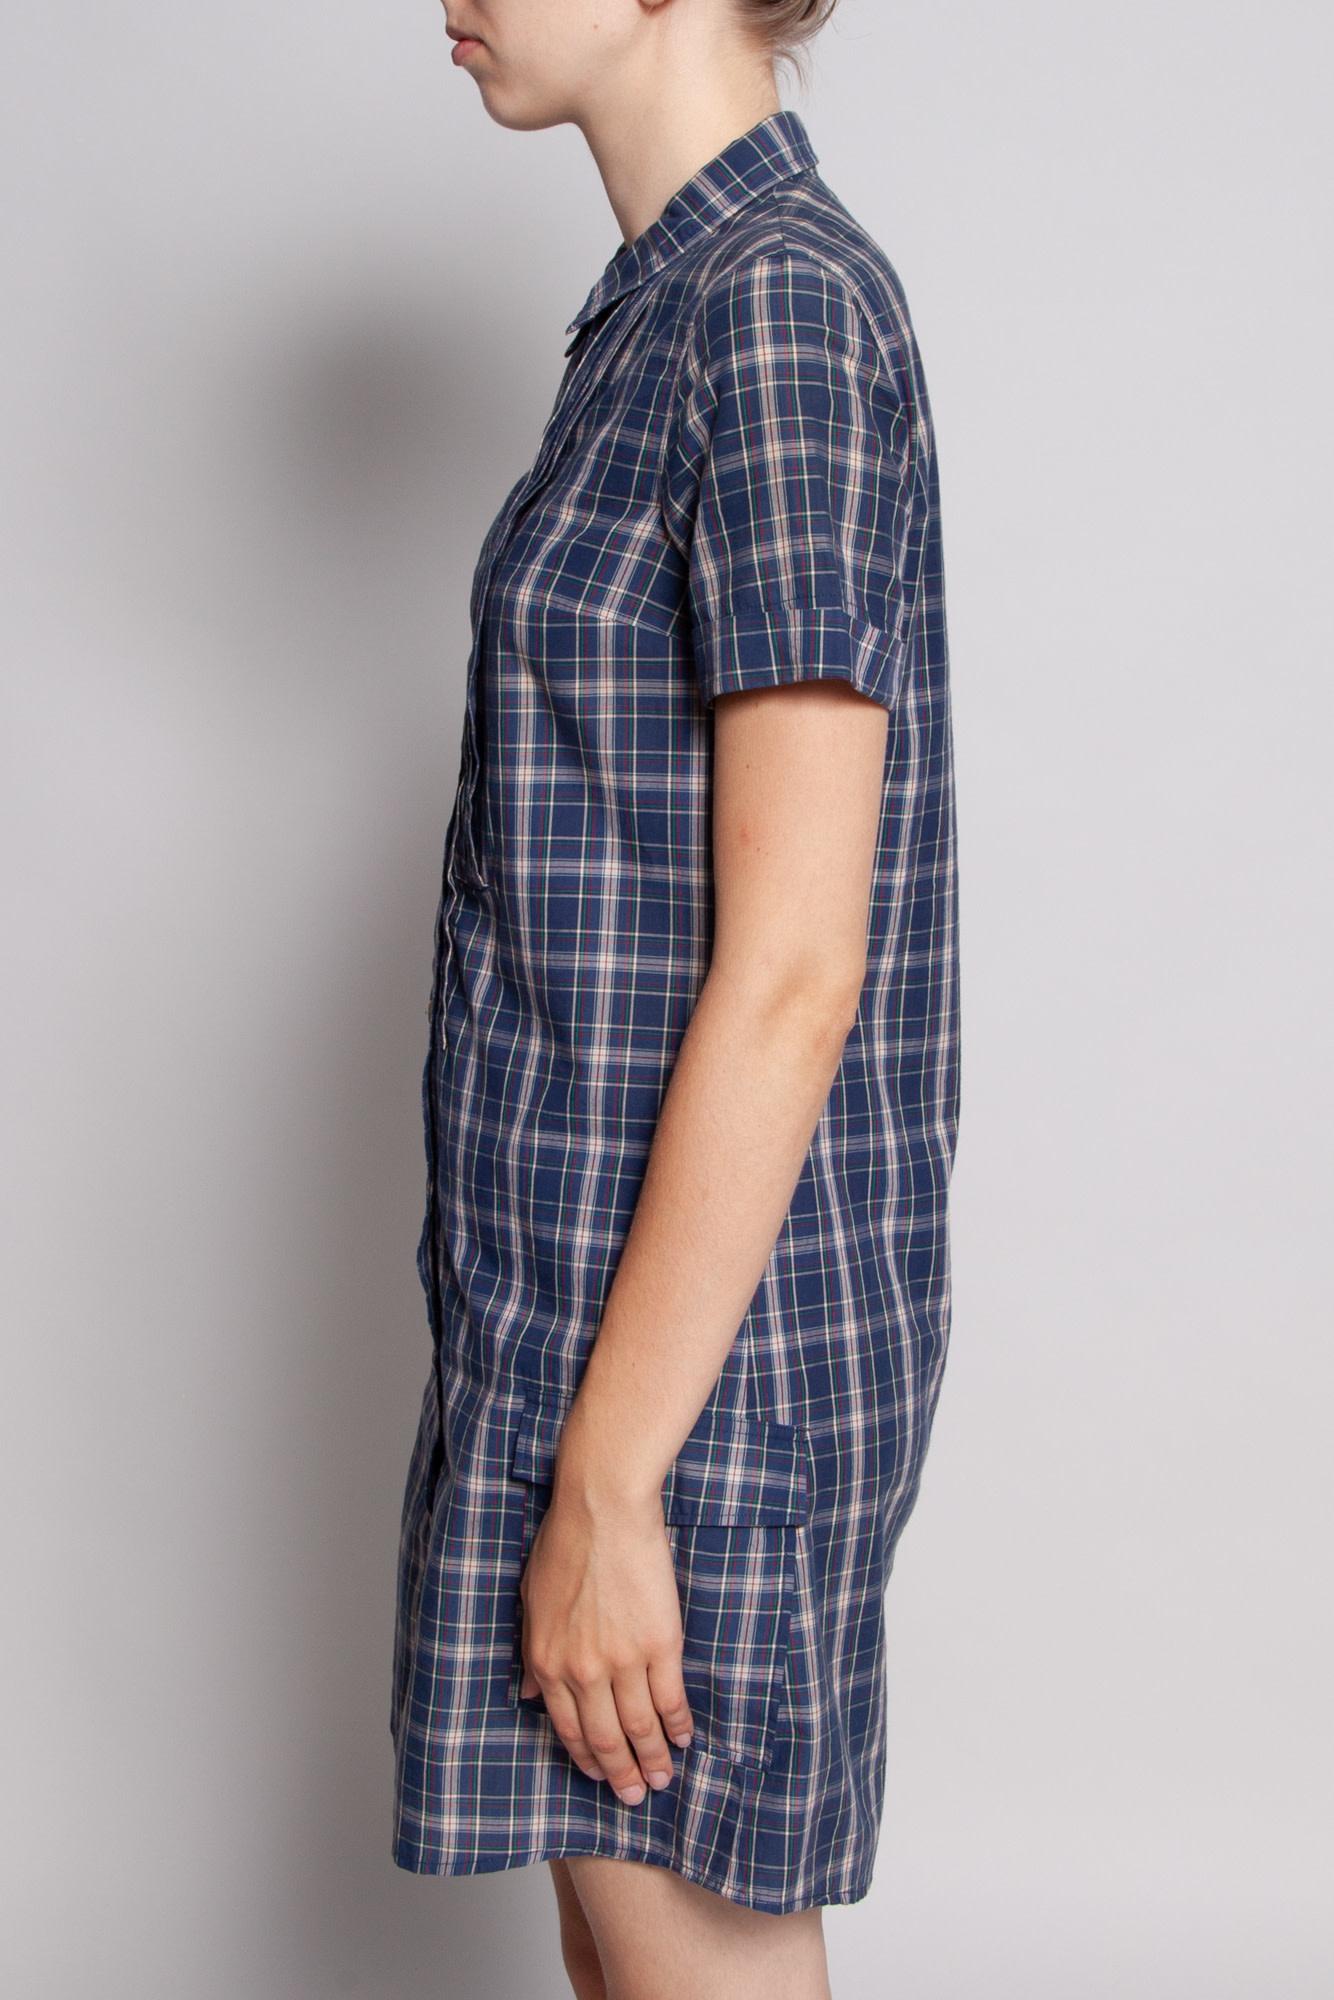 A.P.C. SHORT-SLEEVED PLAID SHIRT DRESS